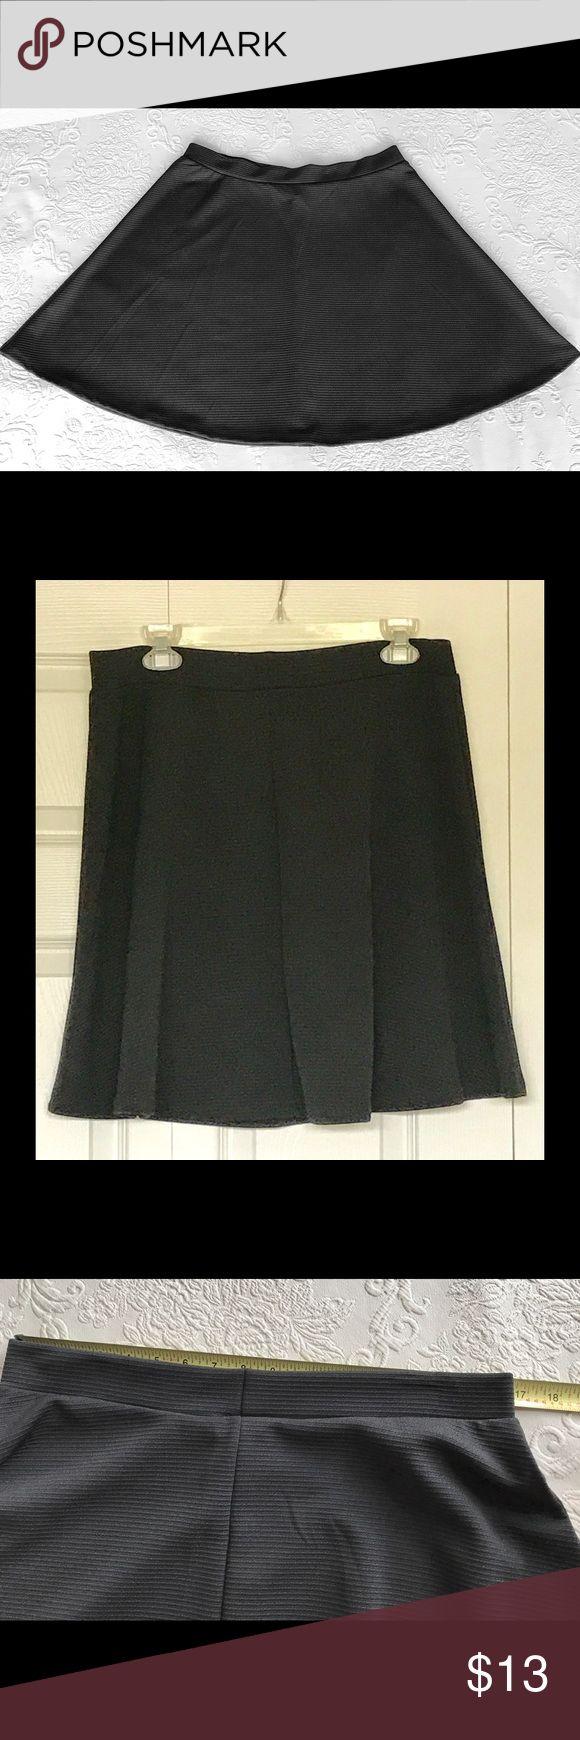 S A L E !Circle Skirt H&M cute flirty black circle skirt, unlined, 17 inches waist, waistband elastic, no zipper, 20 inches long from top of waist band. H&M Skirts Circle & Skater